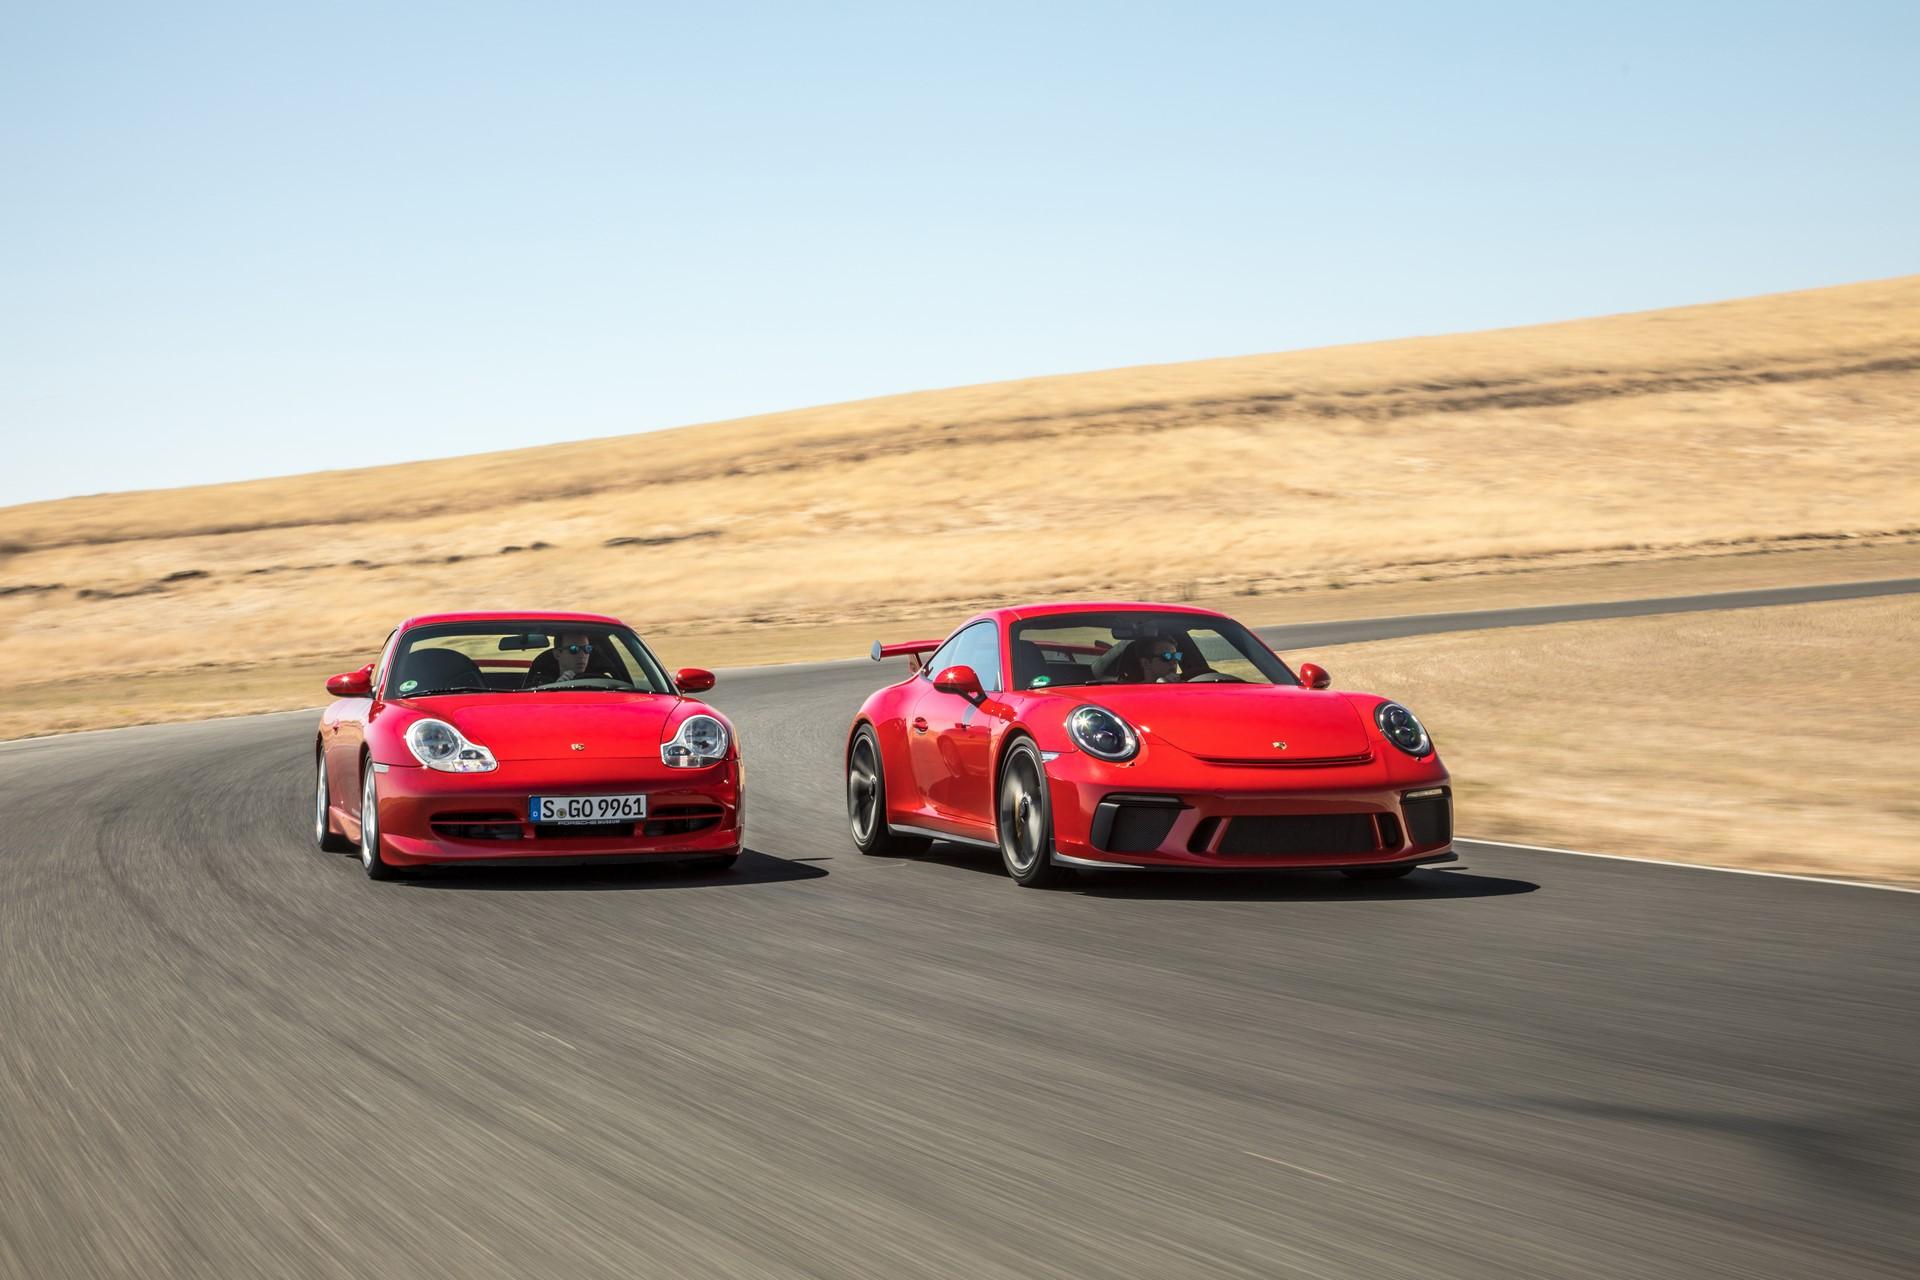 20-years-of-the-Porsche-911-GT3-1